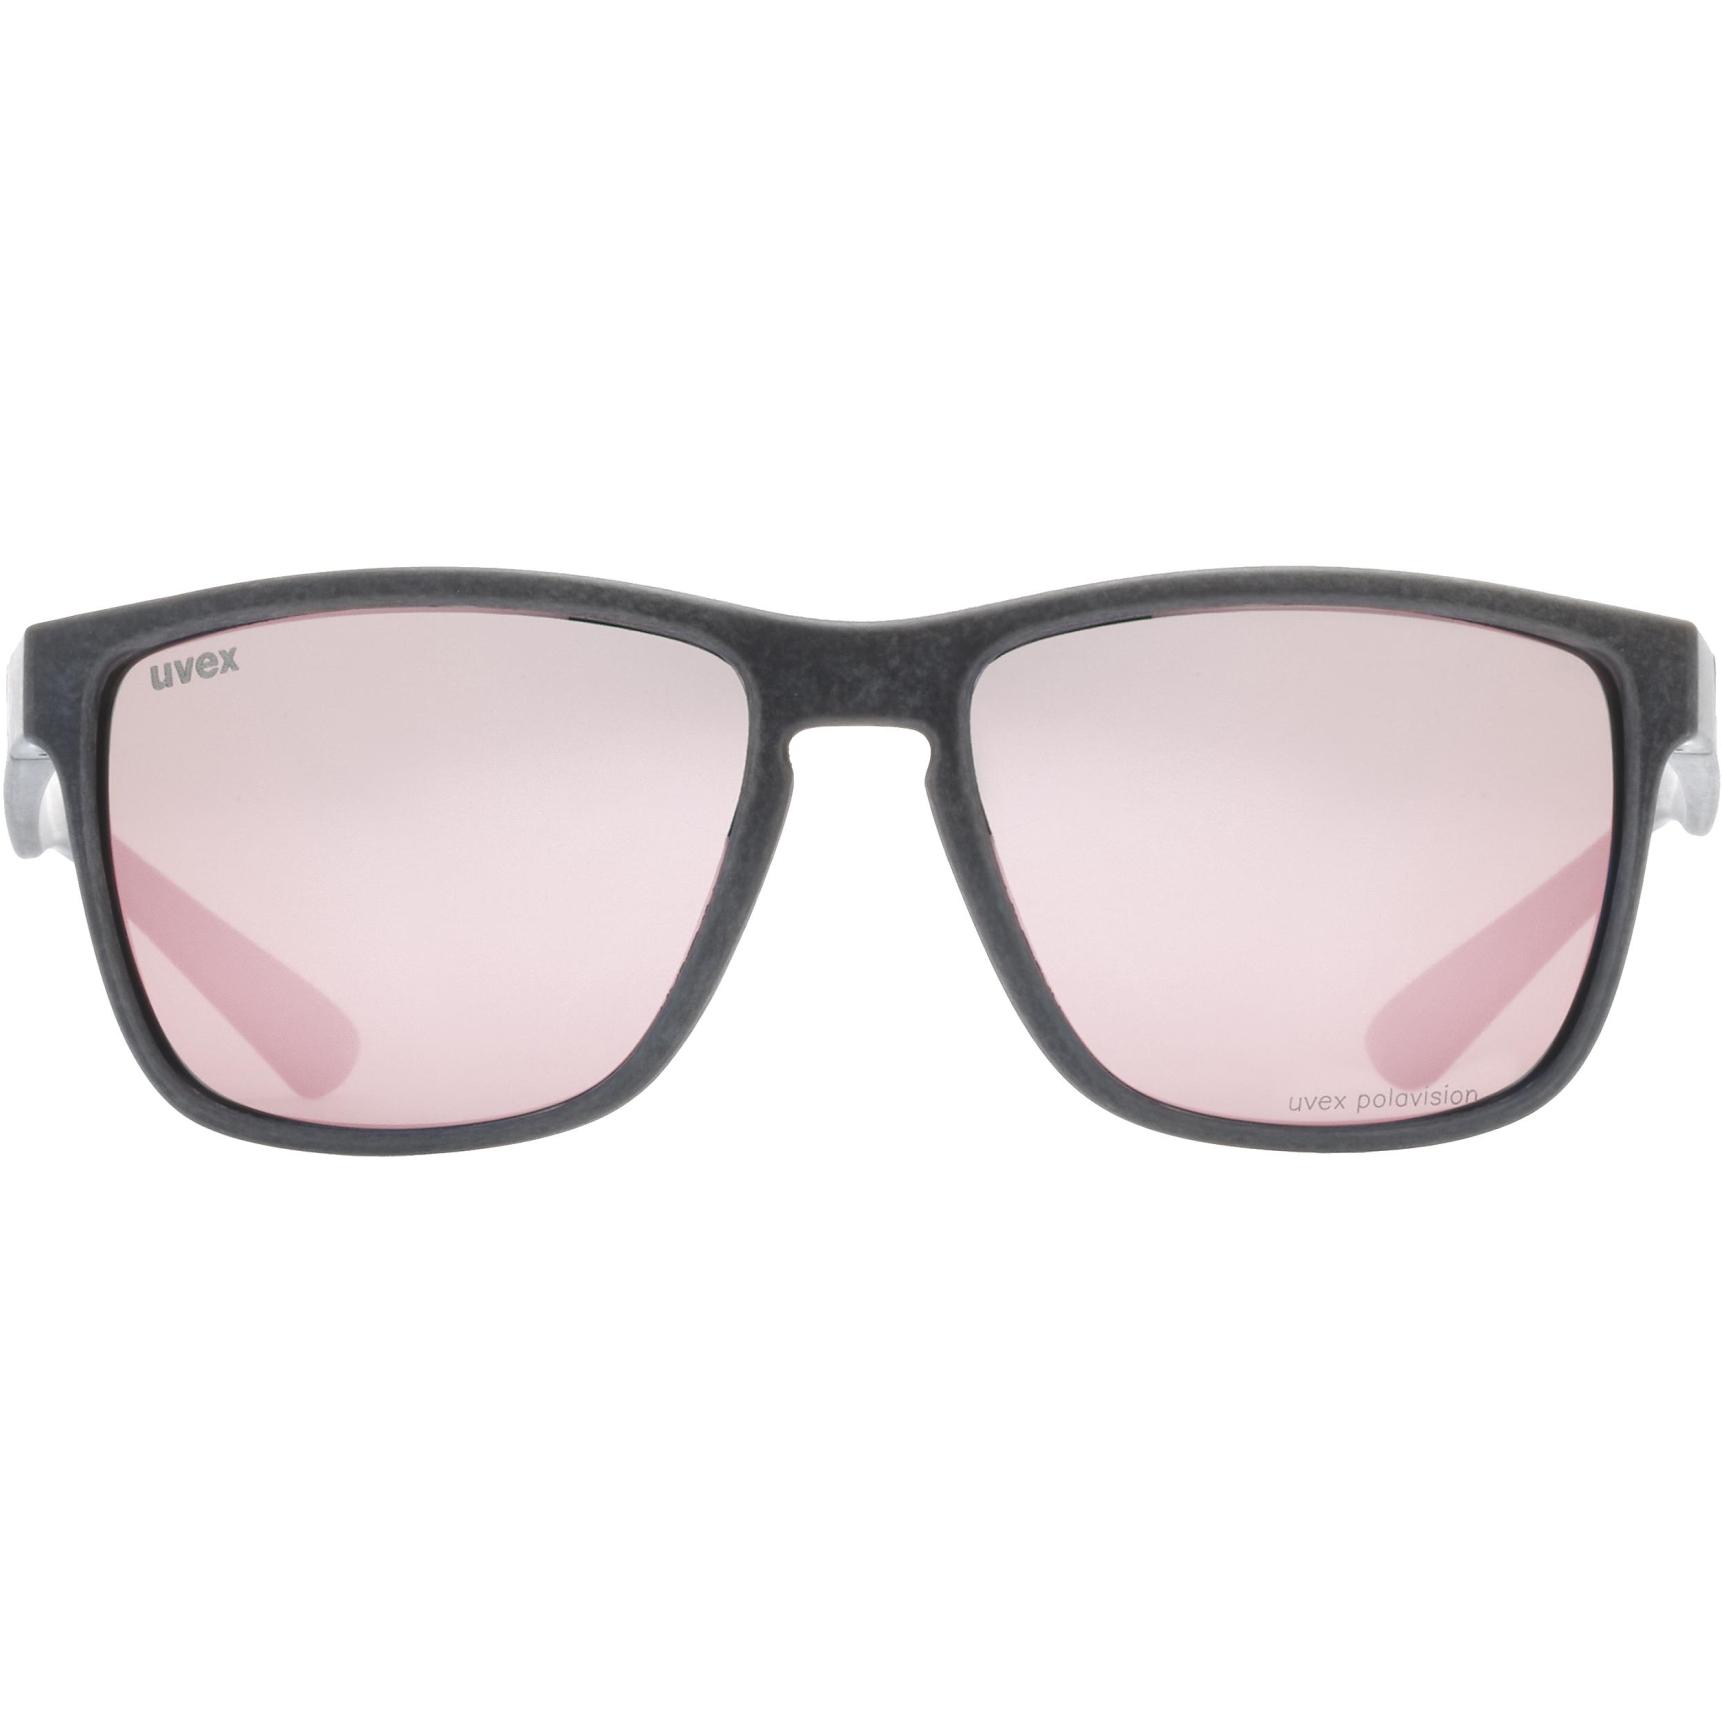 Bild von Uvex lgl ocean 2 P Brille - black mat/polavision mirror rose